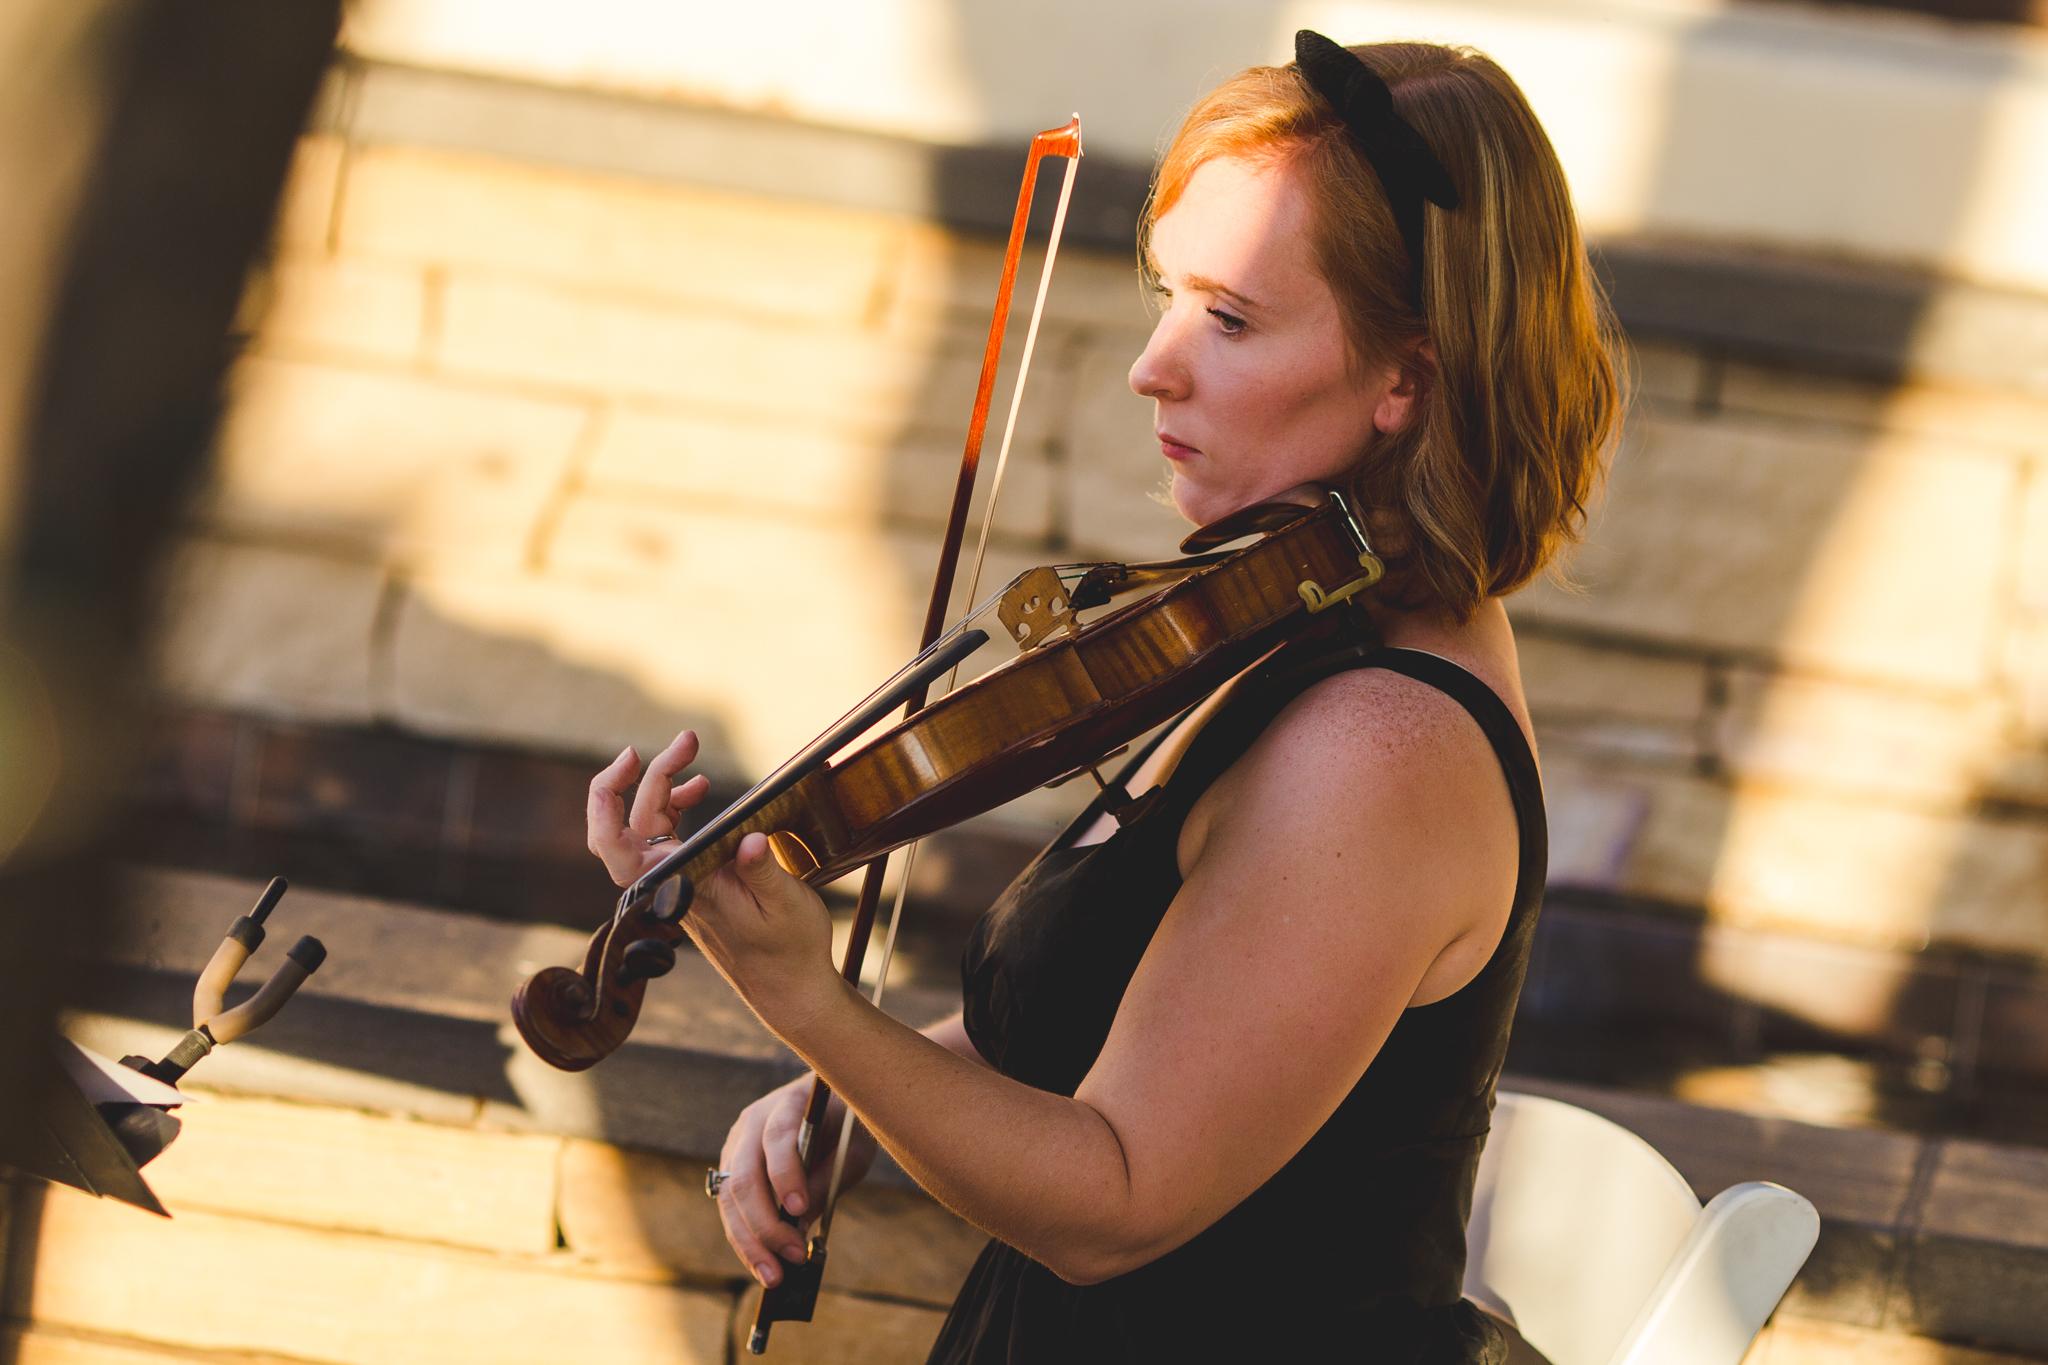 violinist plays at wedding